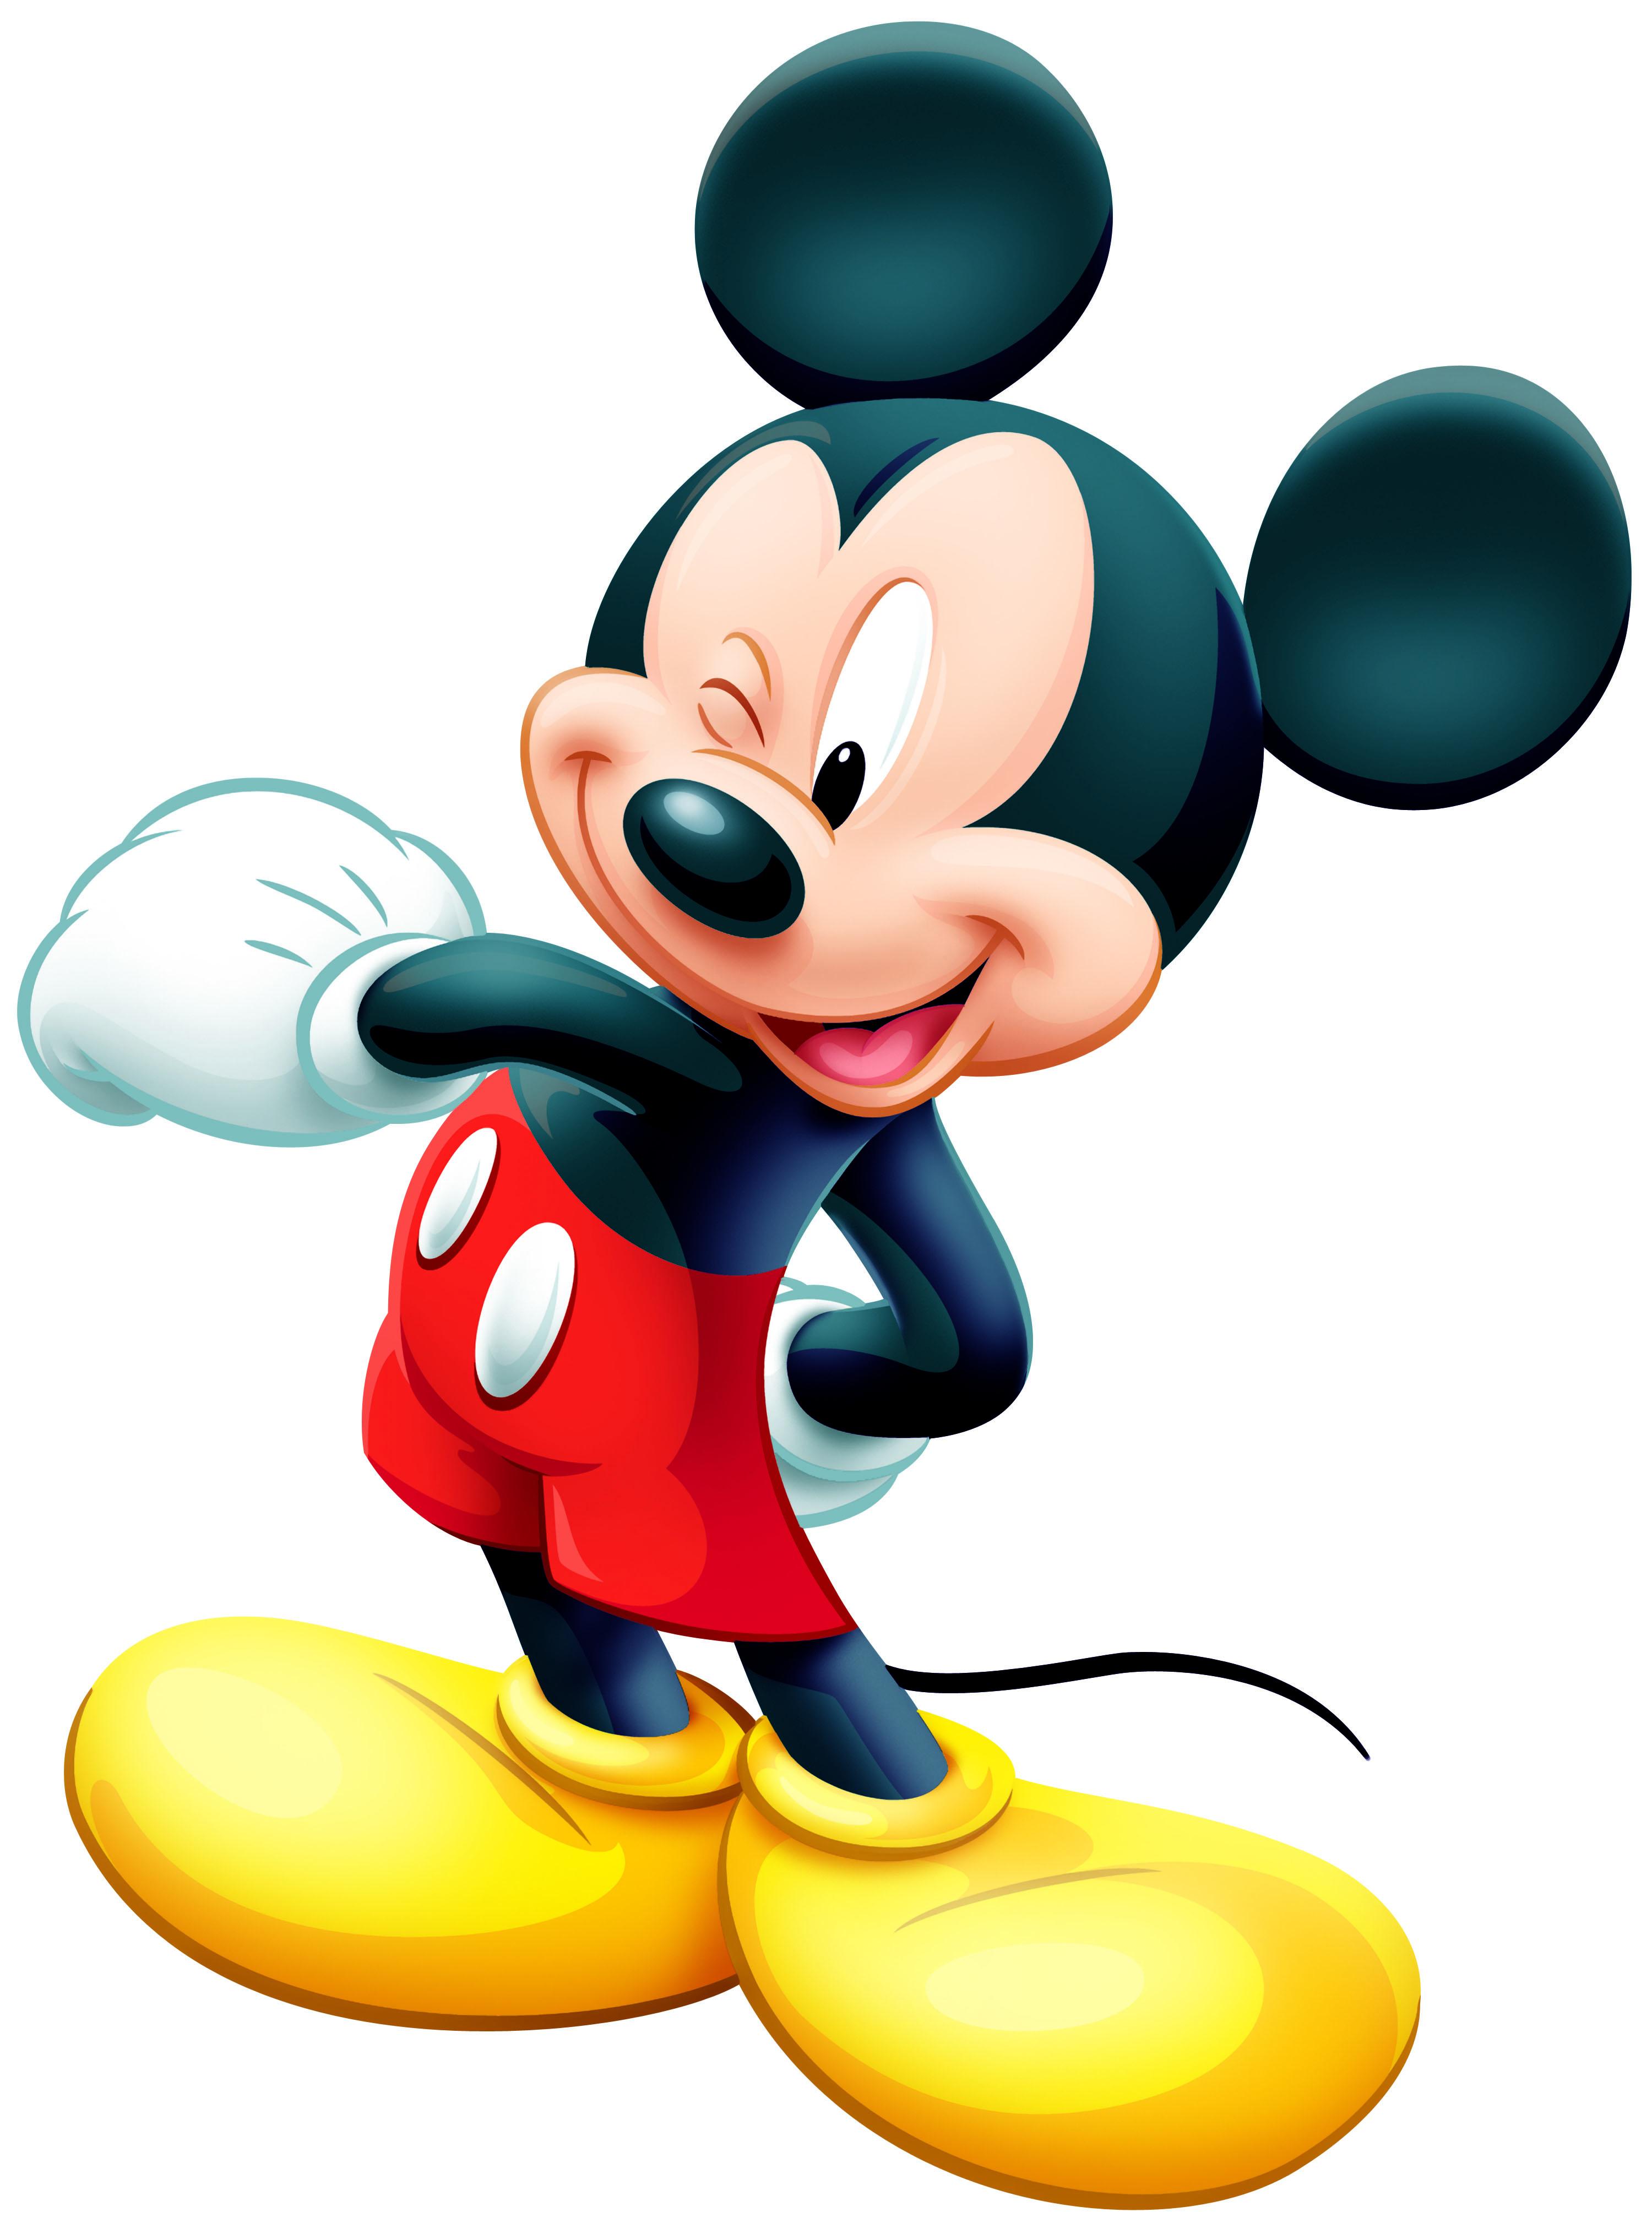 3000x4057 Lot De 3 Masques Mickey Mouse Disney Vente D'Articles De